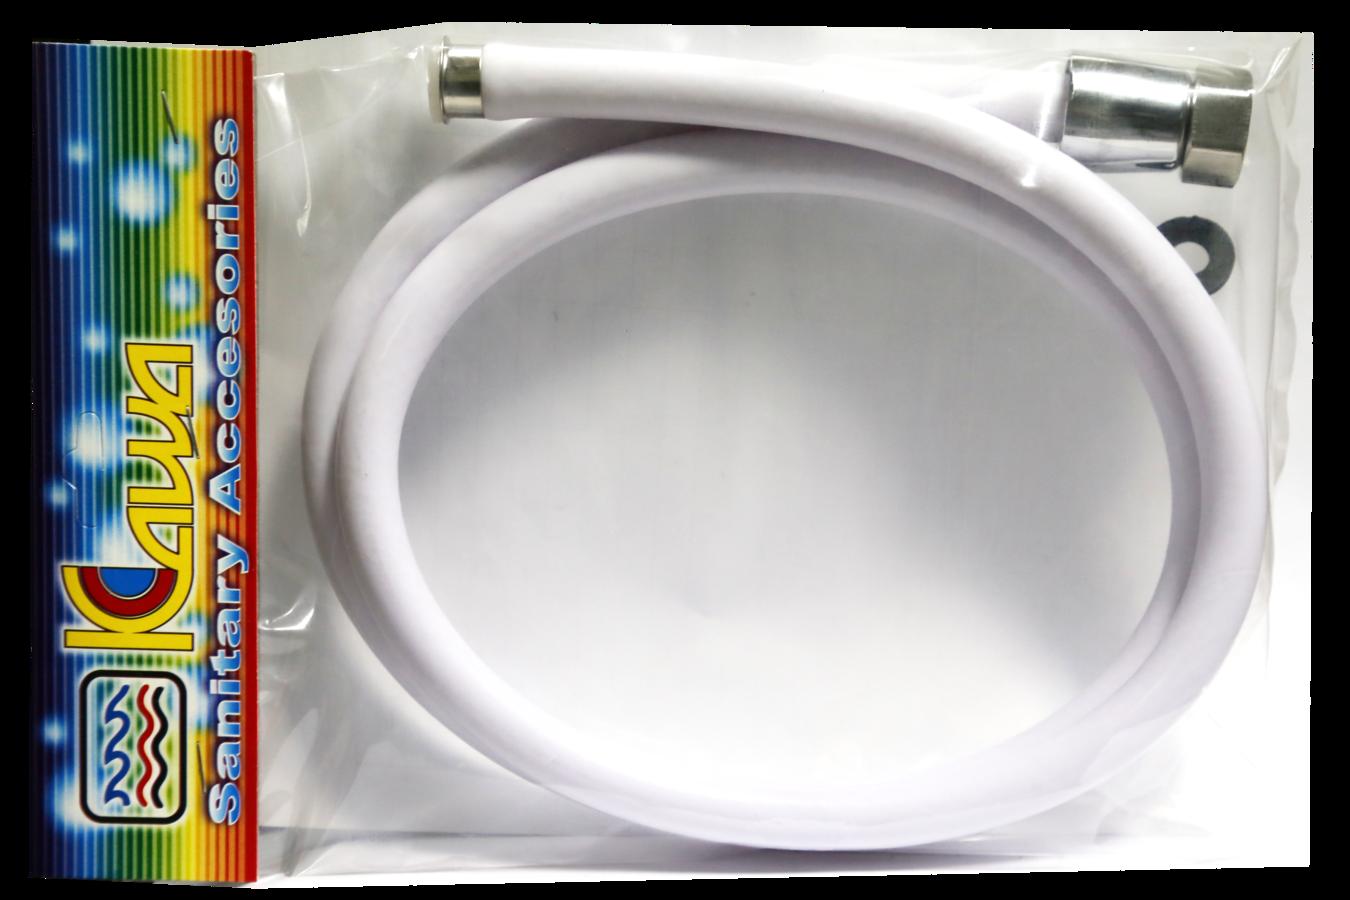 Original product215 image3